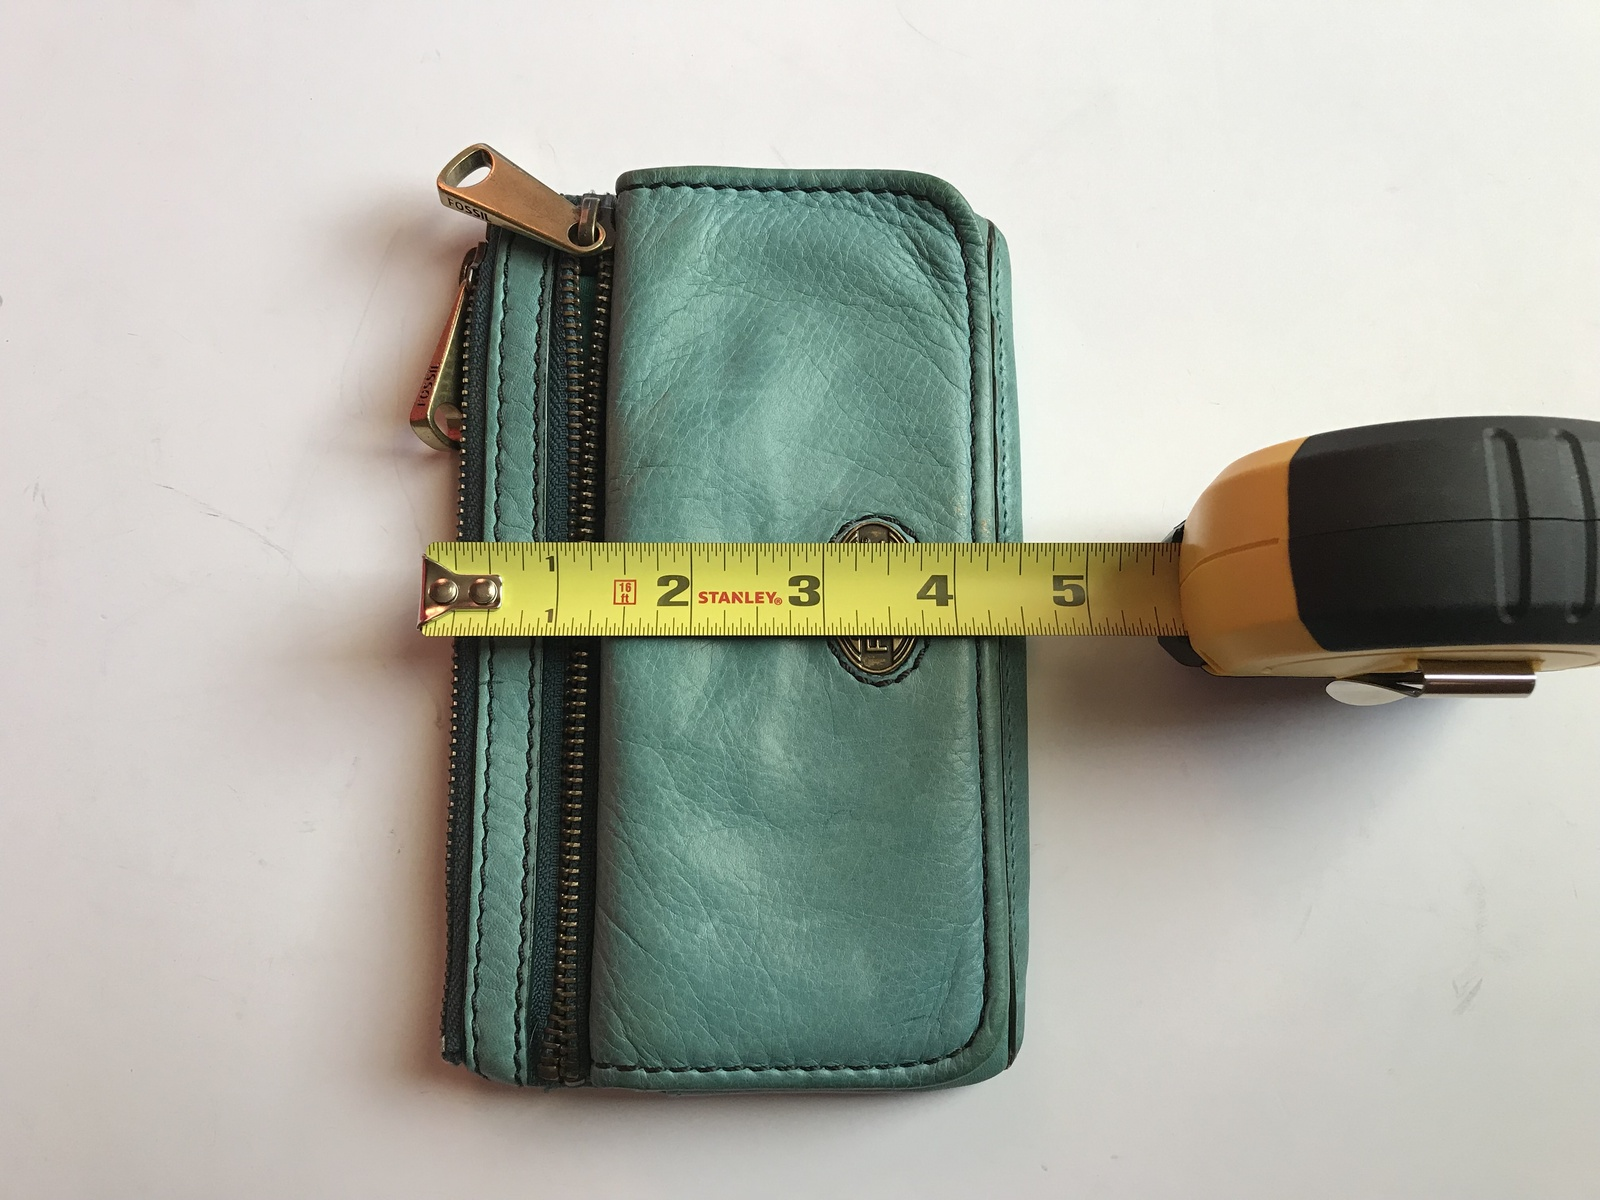 Fossil Explorer Teal Color Flap Clutch Wallet